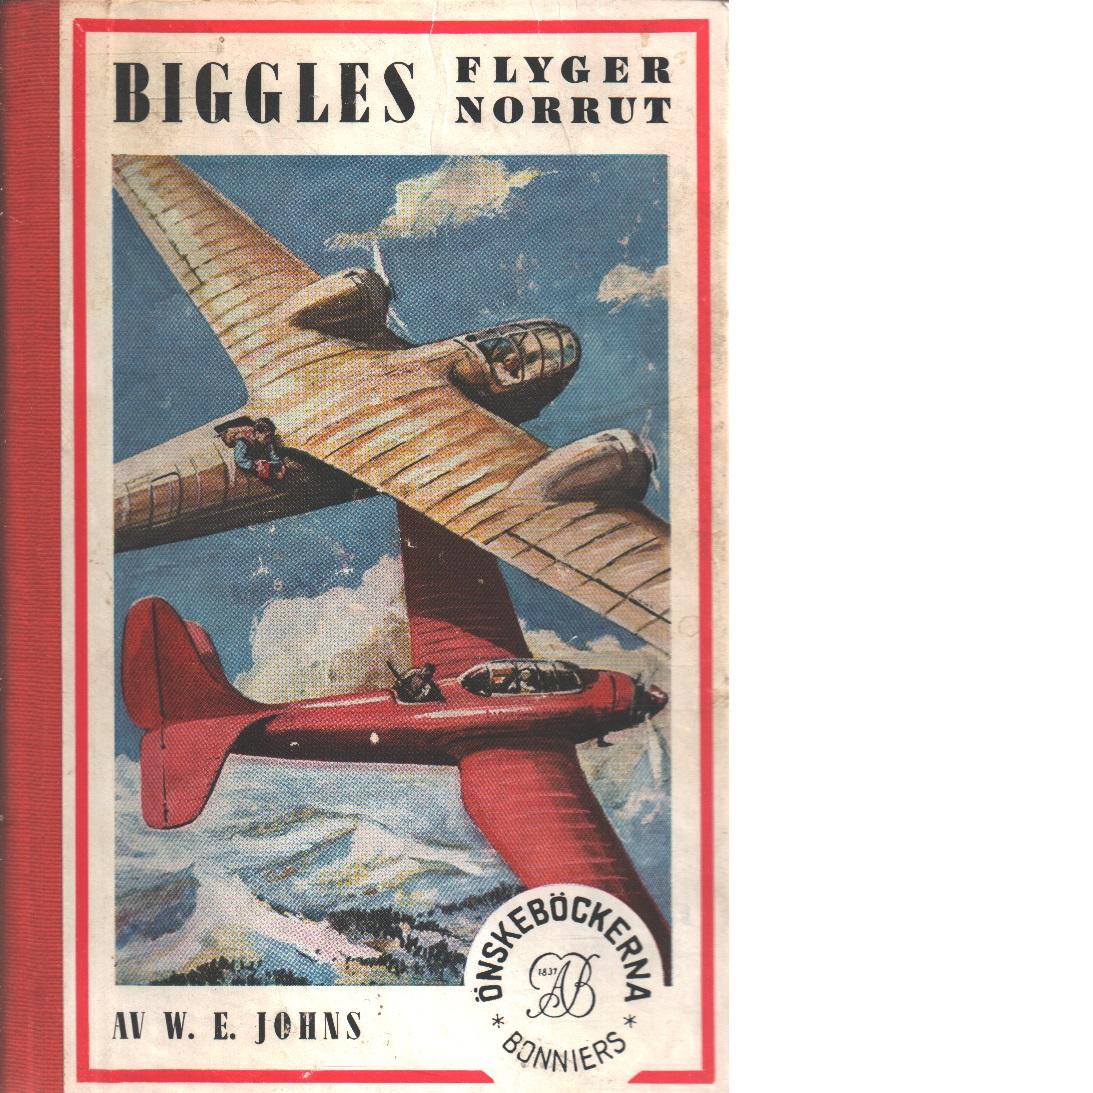 Biggles flyger norrut - Johns, William Earl